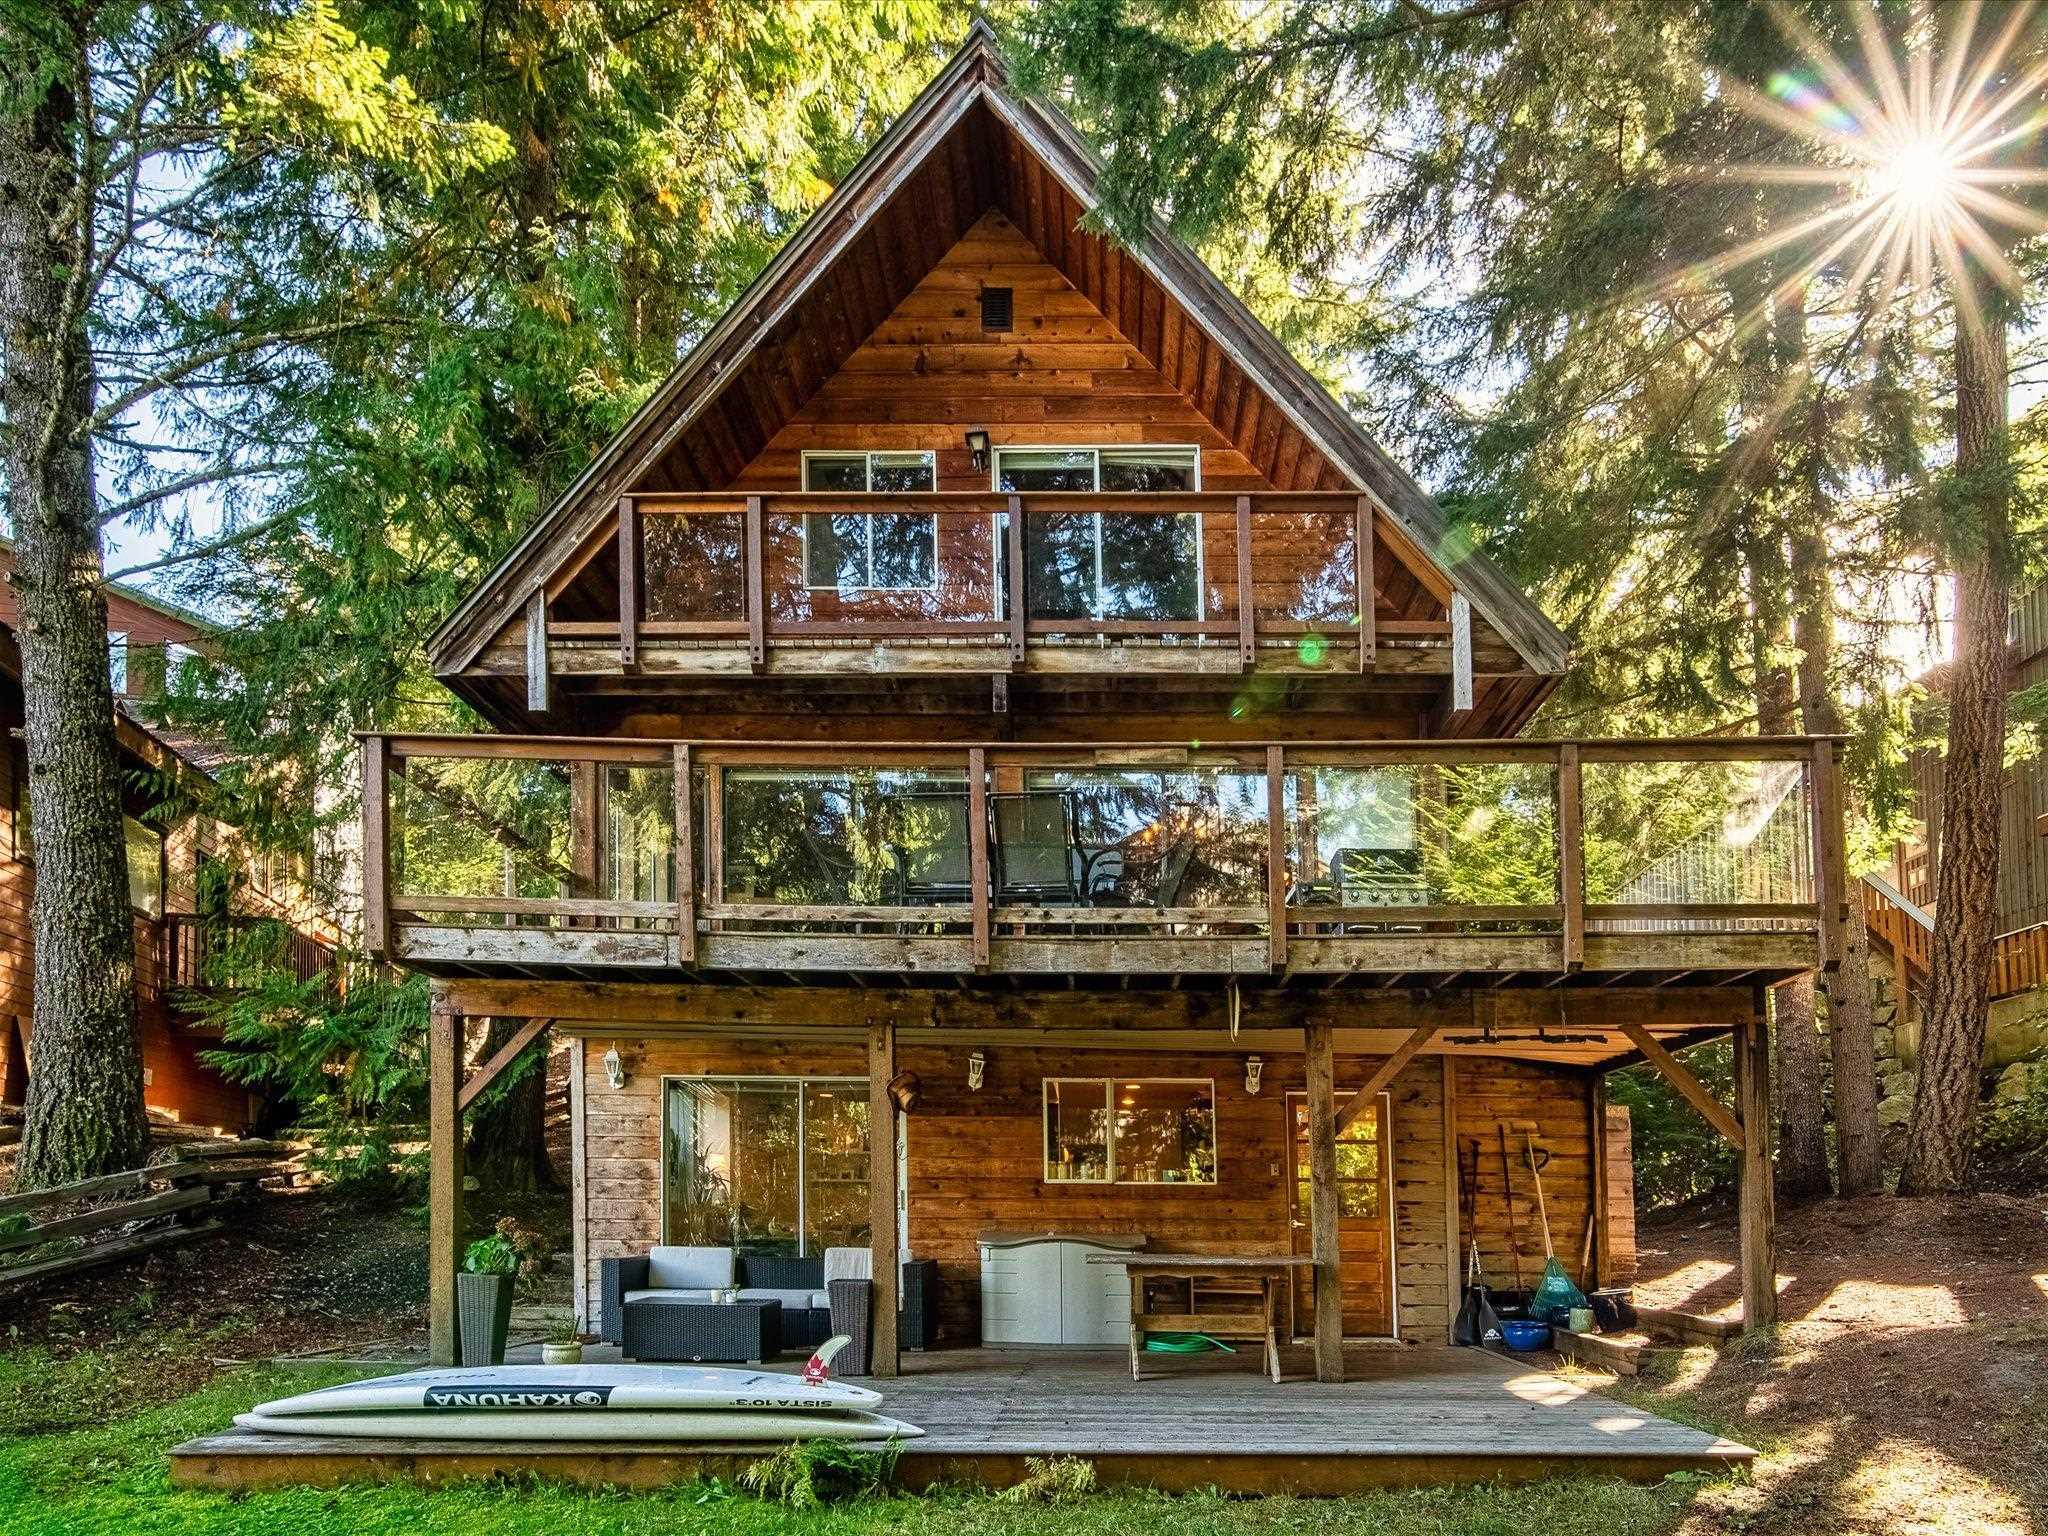 3246 ARCHIBALD WAY - Alta Vista House/Single Family for sale, 6 Bedrooms (R2620768)